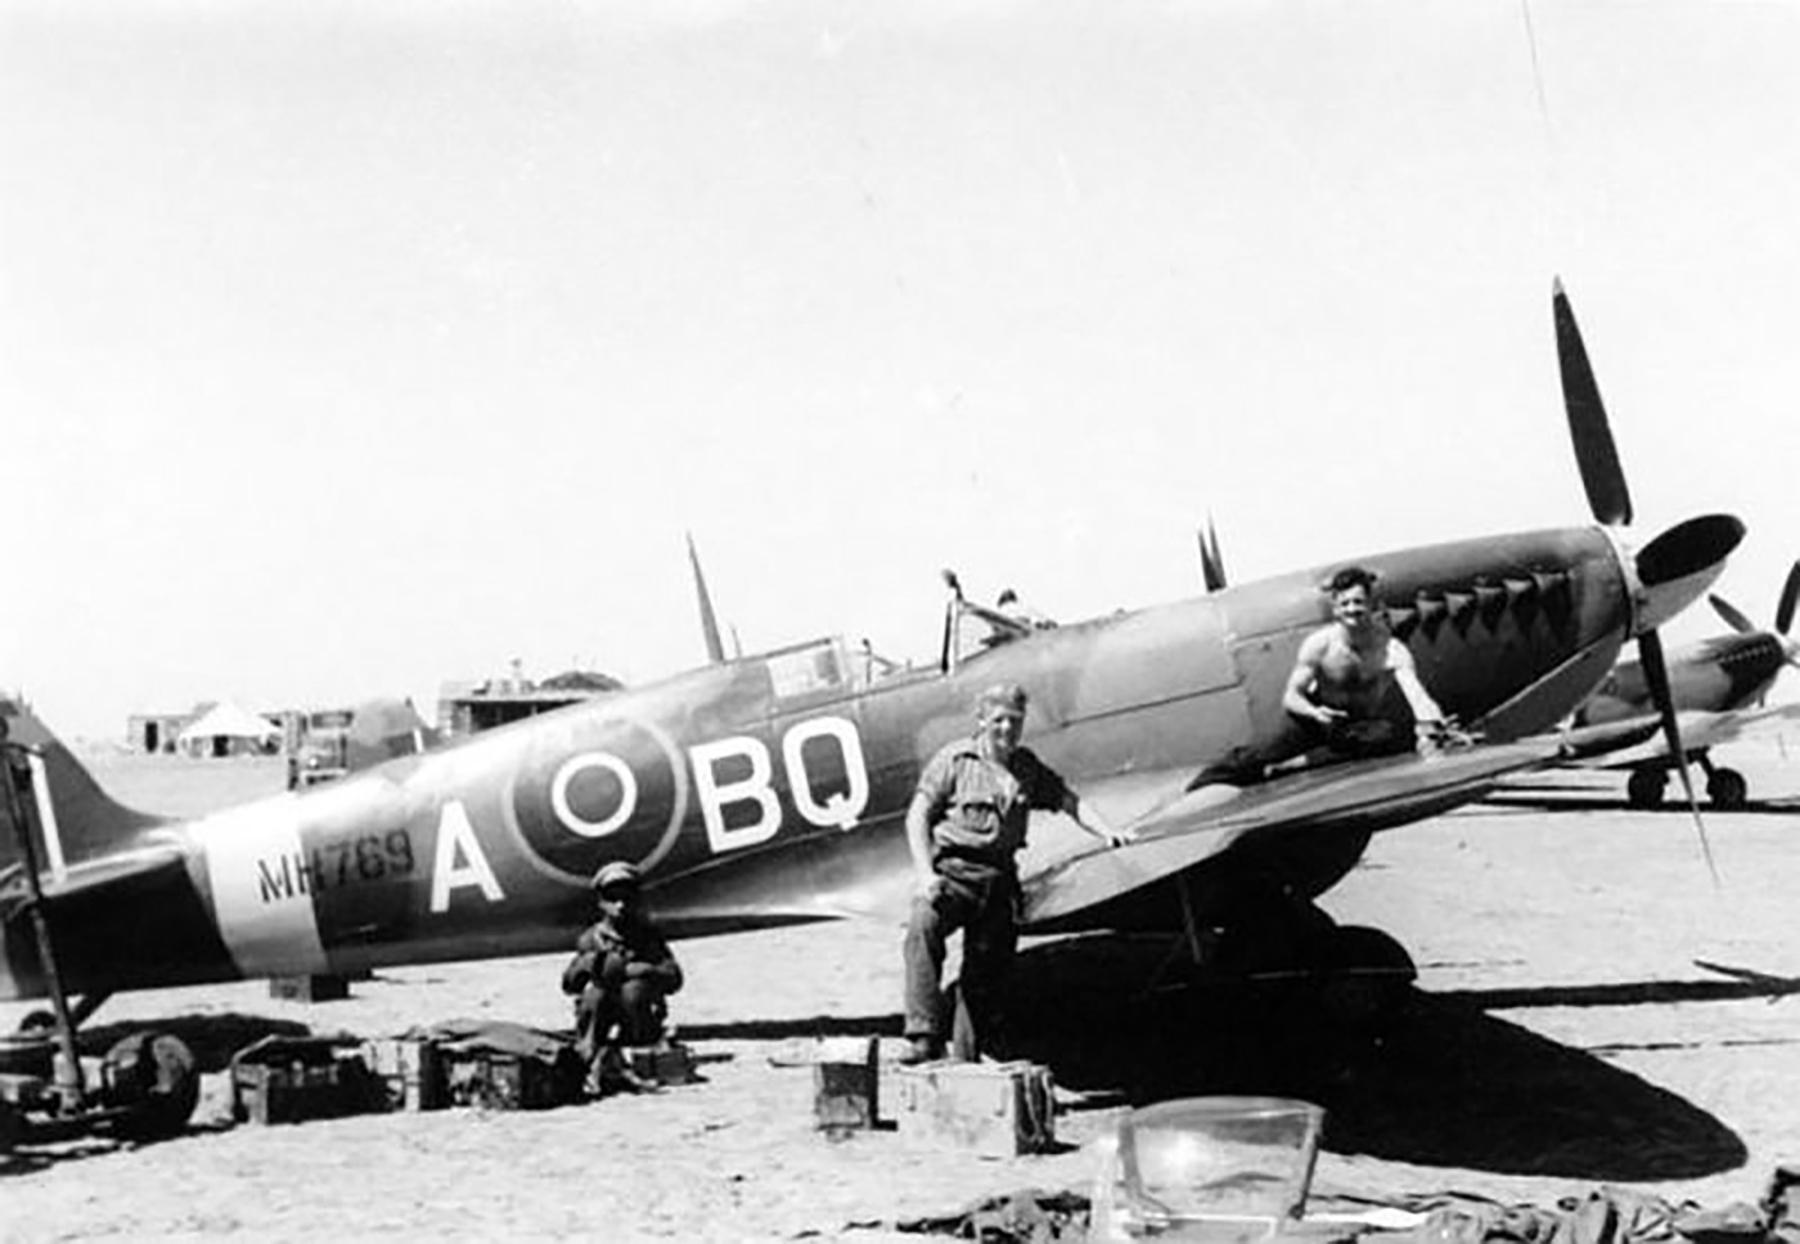 Spitfire IXc RAF 451Sqn BQA MH769 Corsica 1944 01